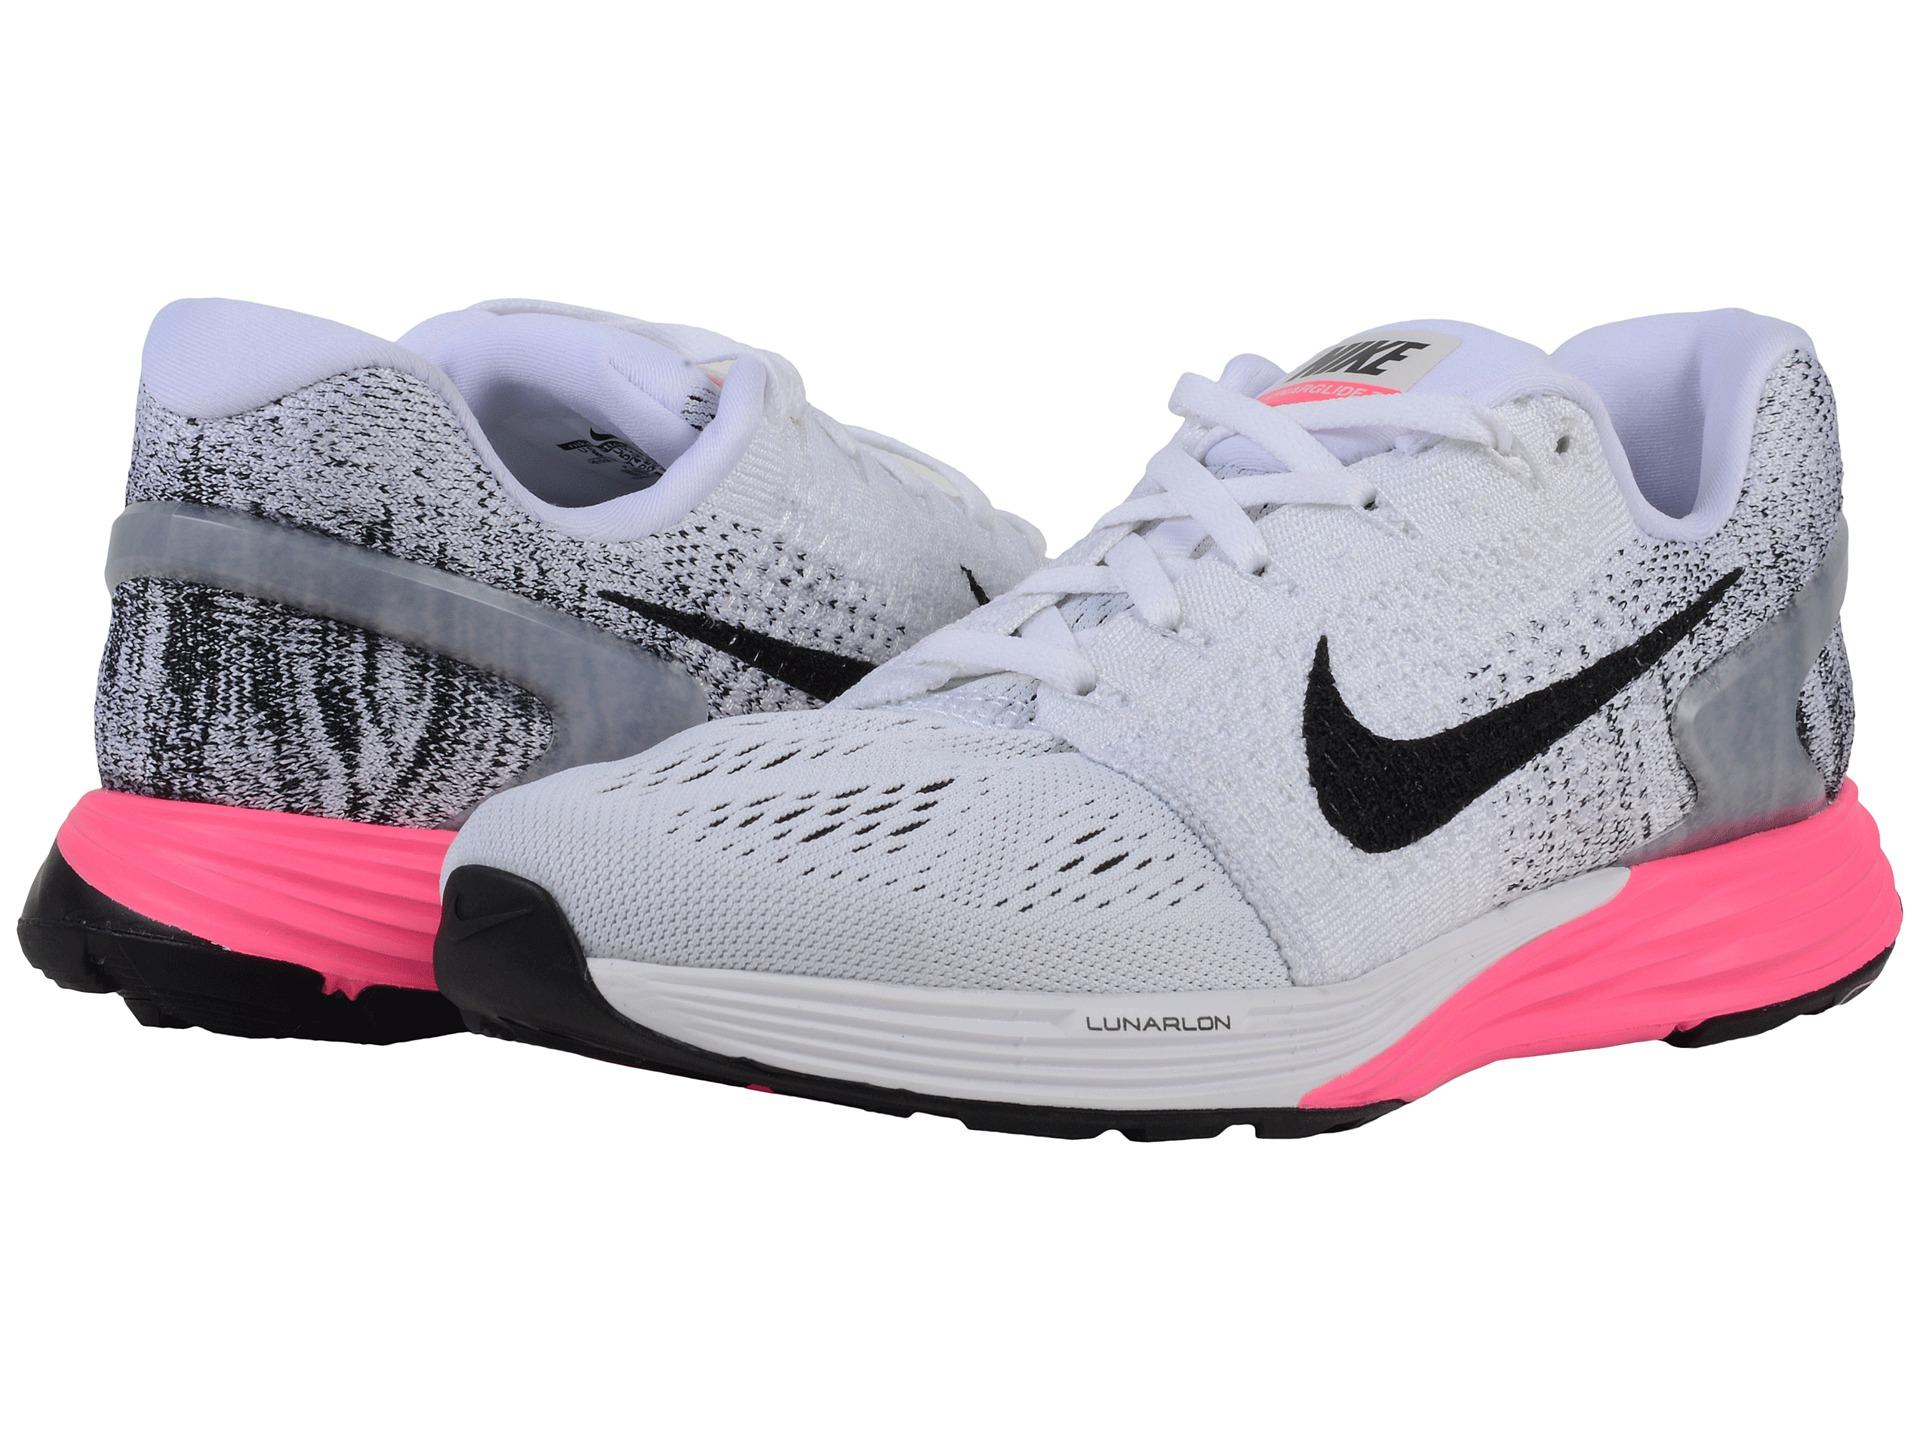 best sneakers 614f9 0c37a czech nike lunarglide 5 womens zappos c505e 17eb2